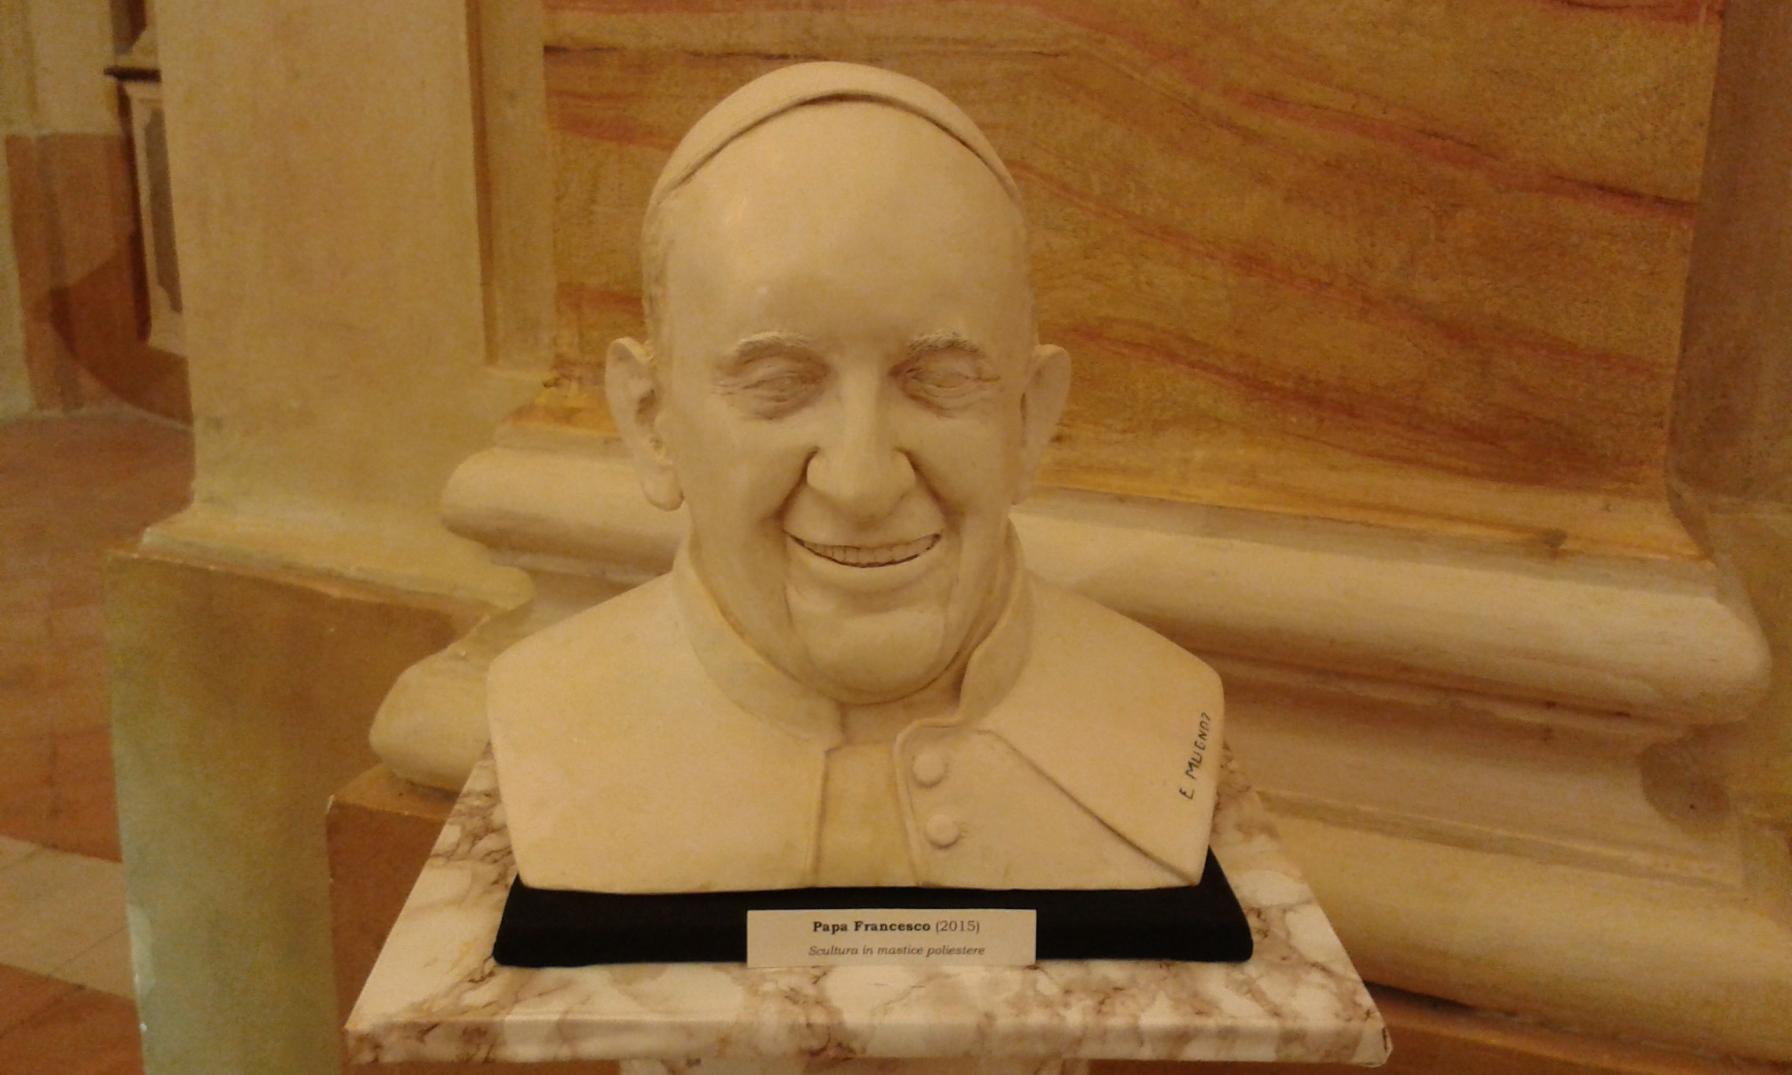 Papa Francesco, busto in mastice pietrificante, 2015